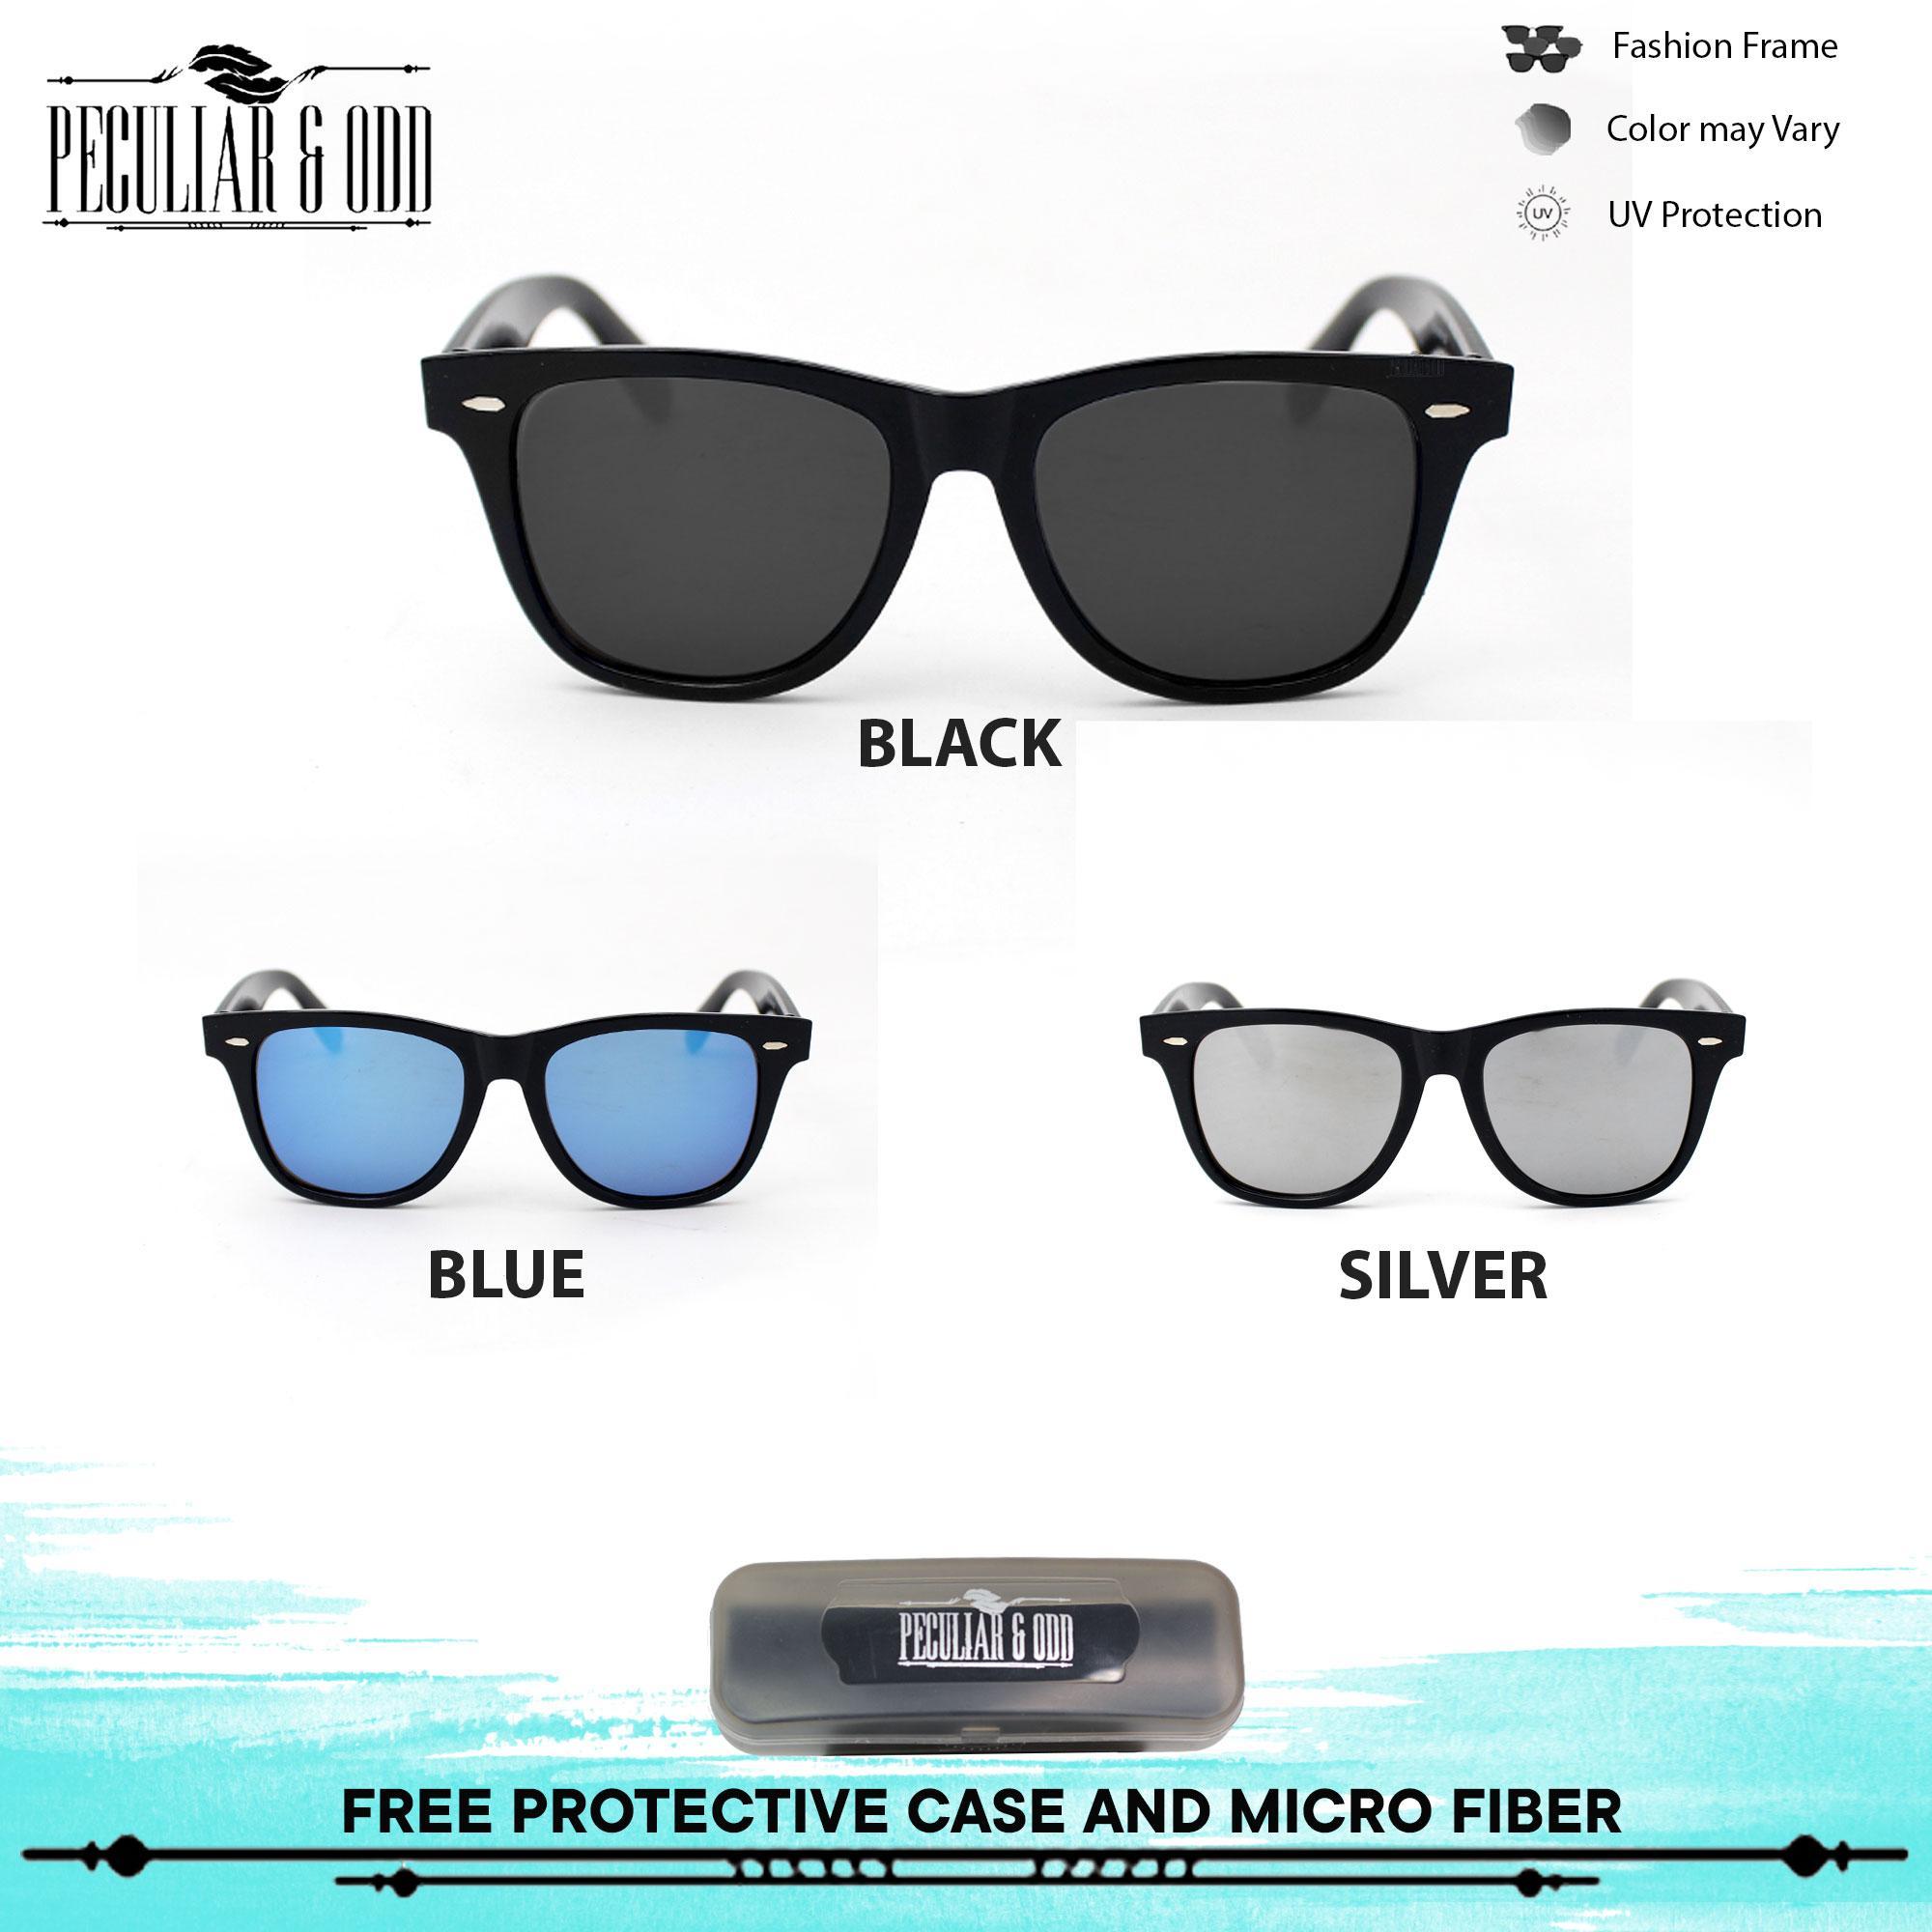 9233cc72aa Peculiar Wayfarer Oversized 1125 Classic Sunglass Eyewear in Acetate Frame